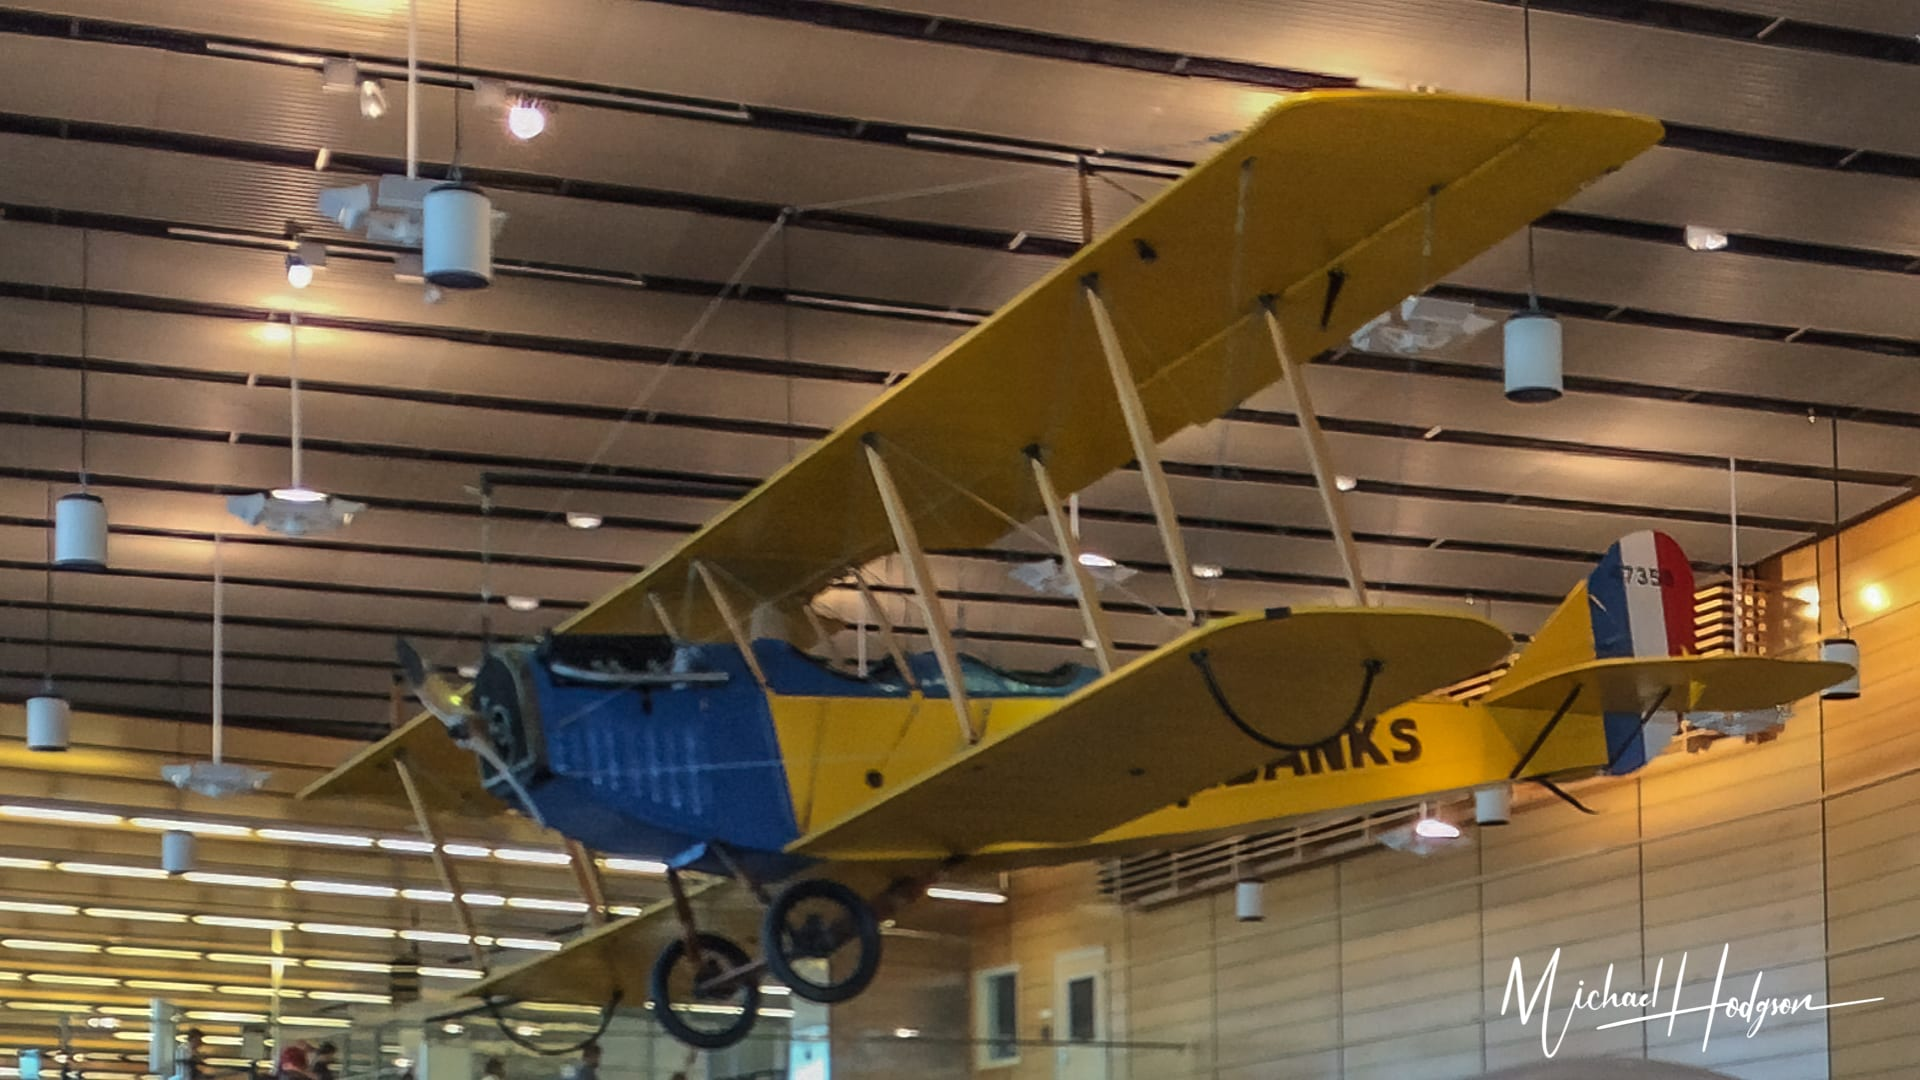 Biplane Fairbanks Airport Flying In Comfort